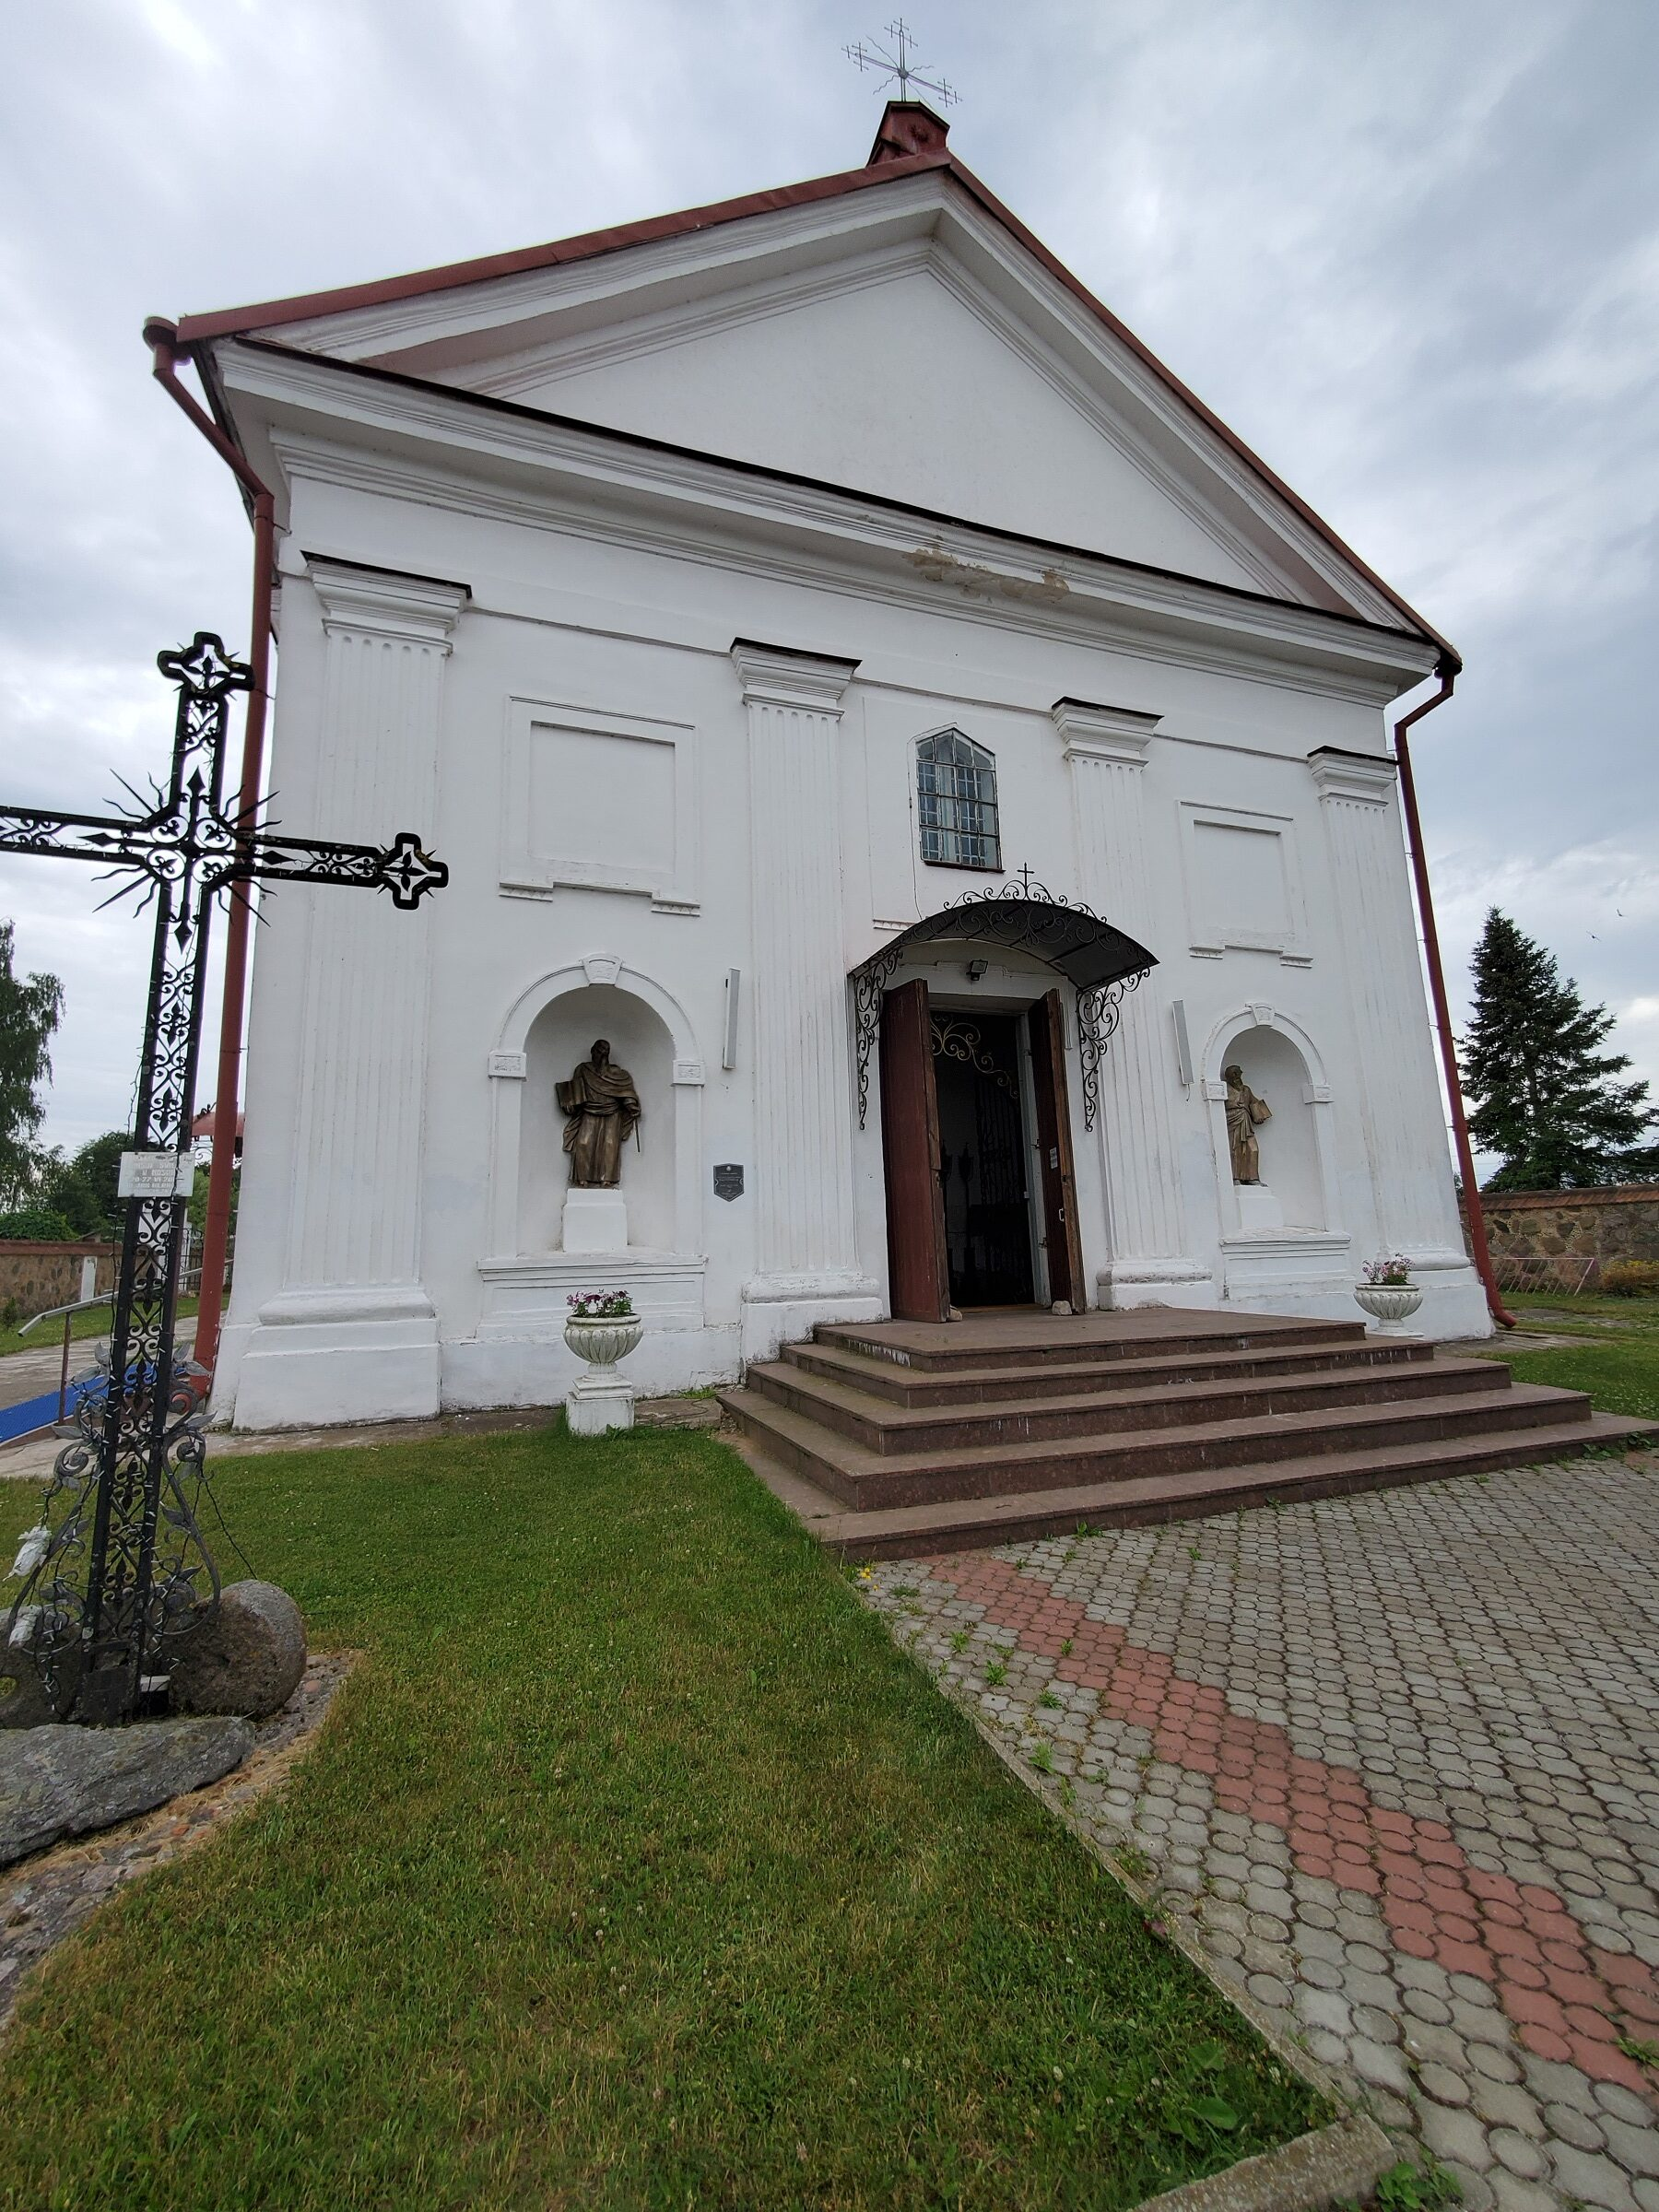 20200703 142753 rotated - Костел Святой Анны в деревне Мосар